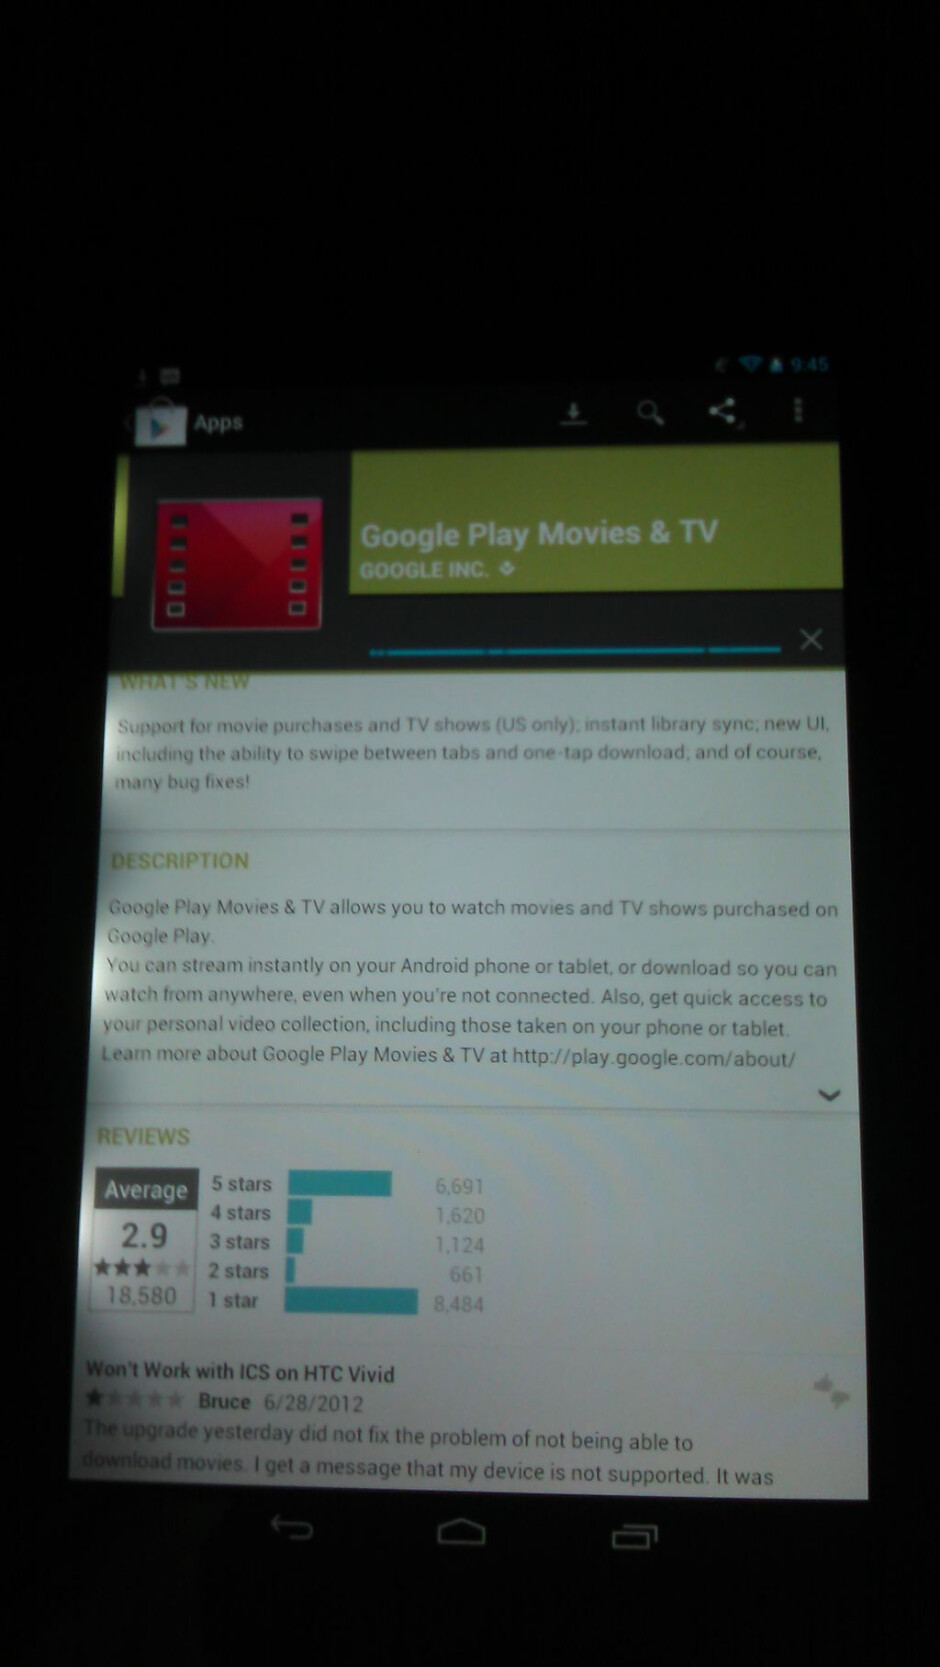 The Google Nexus 7 and the light bleeding issue - Google Nexus 7 light bleeding issue being reported